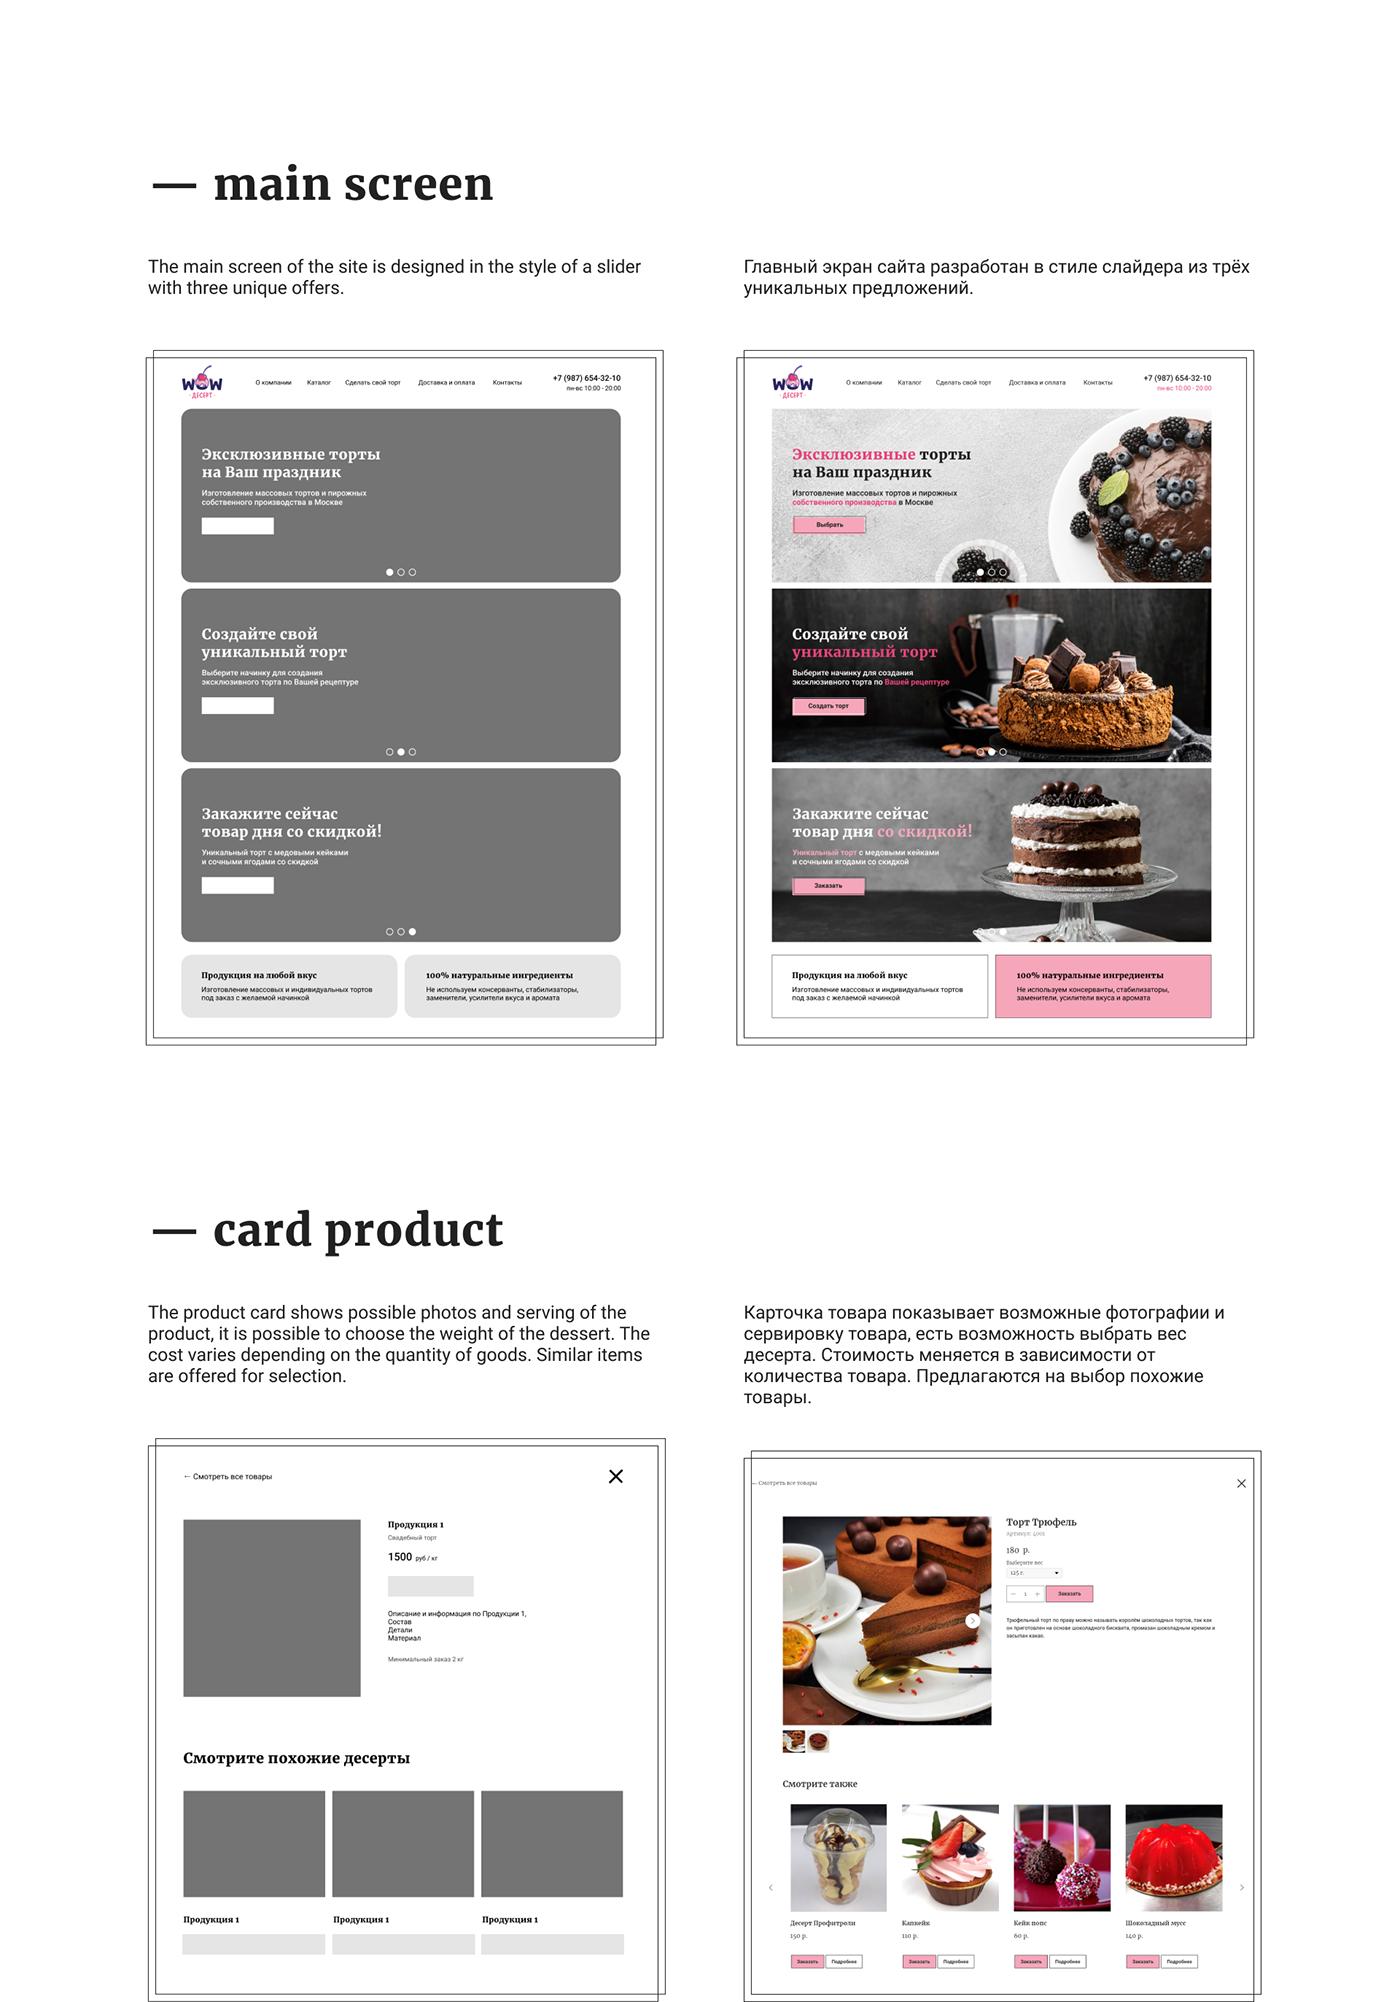 cakes confectionery company desserts online store Russia site of cakes site of desserts ux/ui кондитерская компания сайт тортов